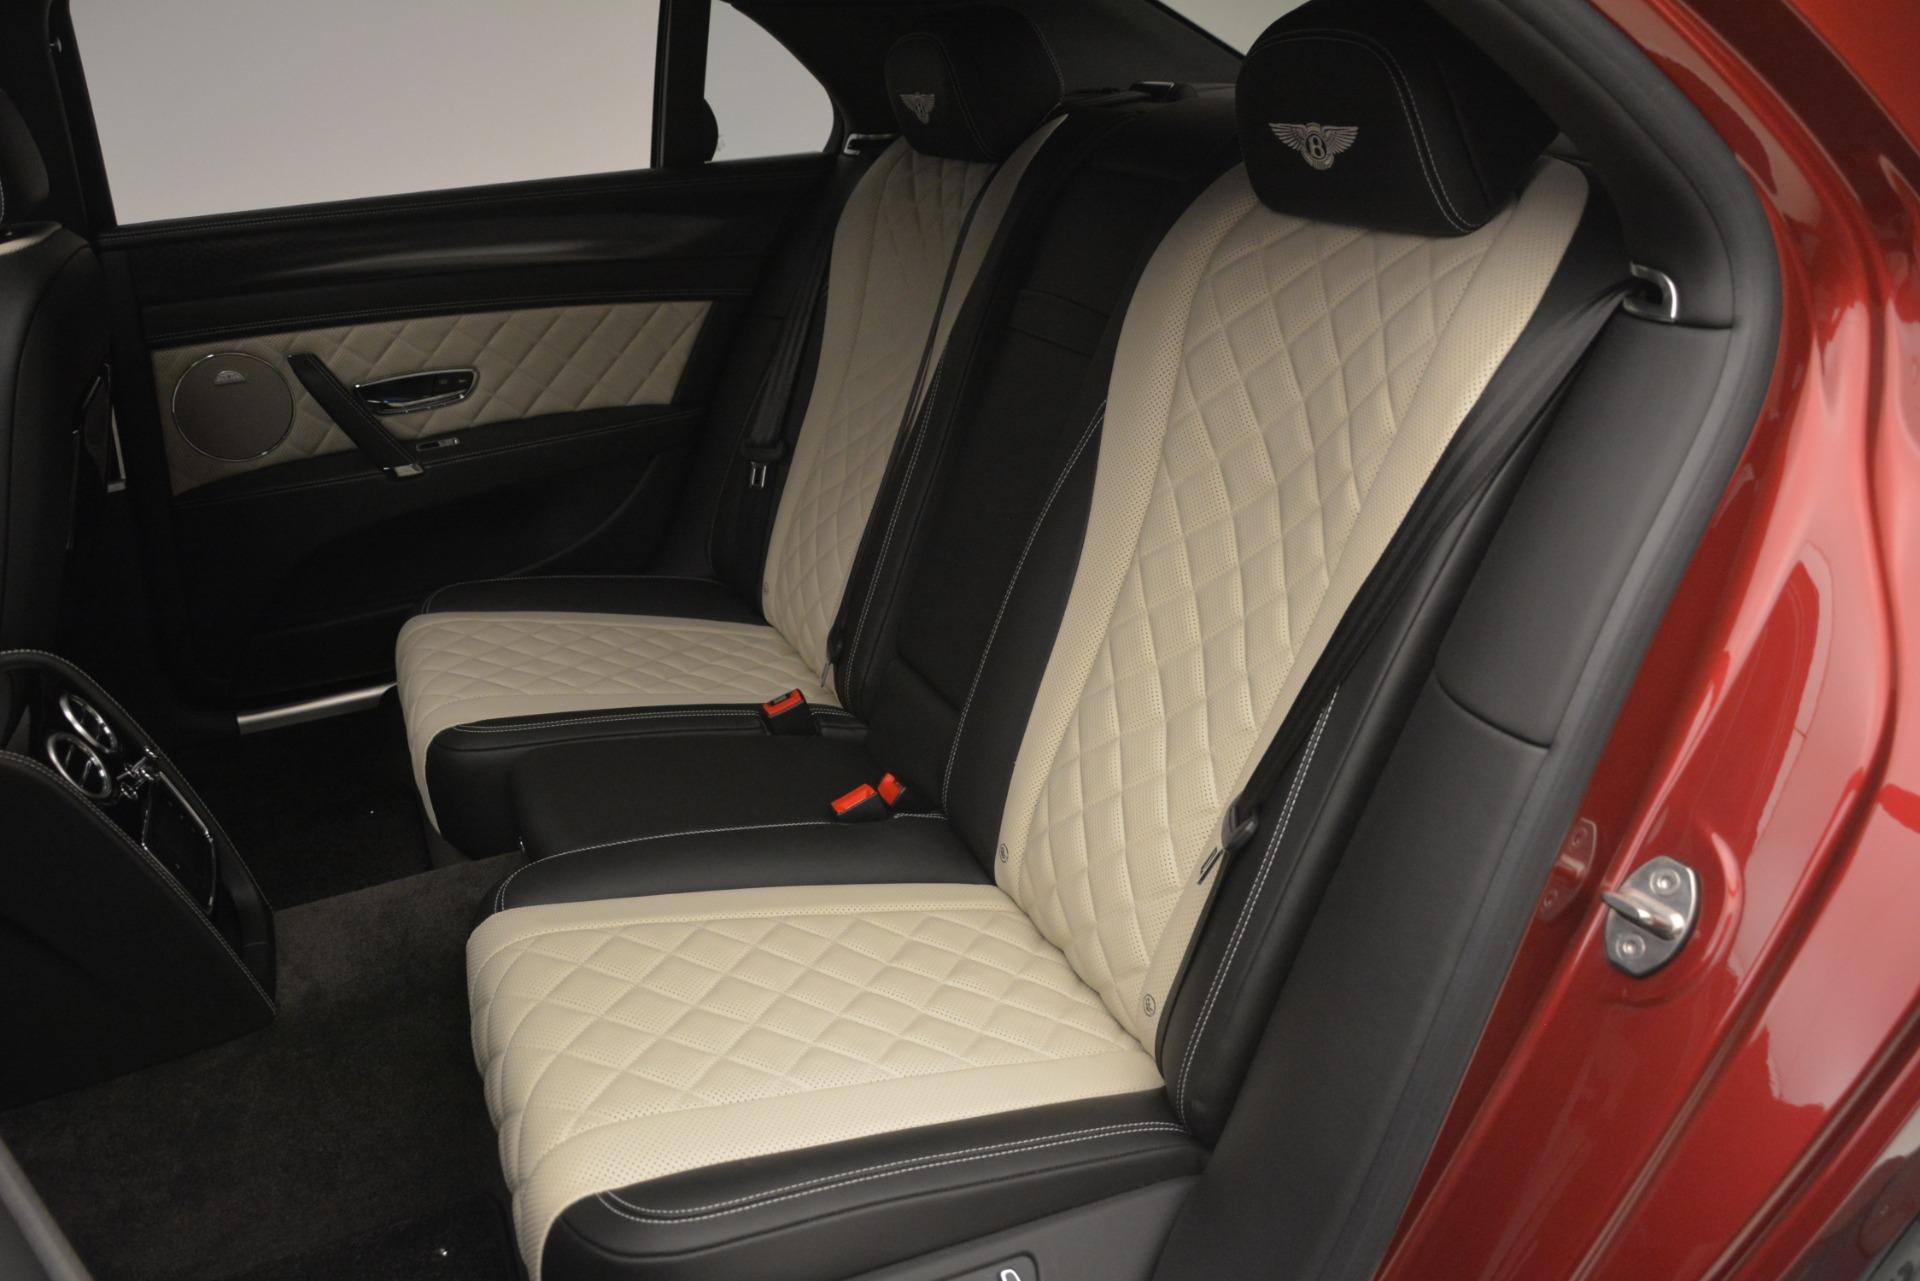 Used 2018 Bentley Flying Spur W12 S For Sale In Westport, CT 3014_p26